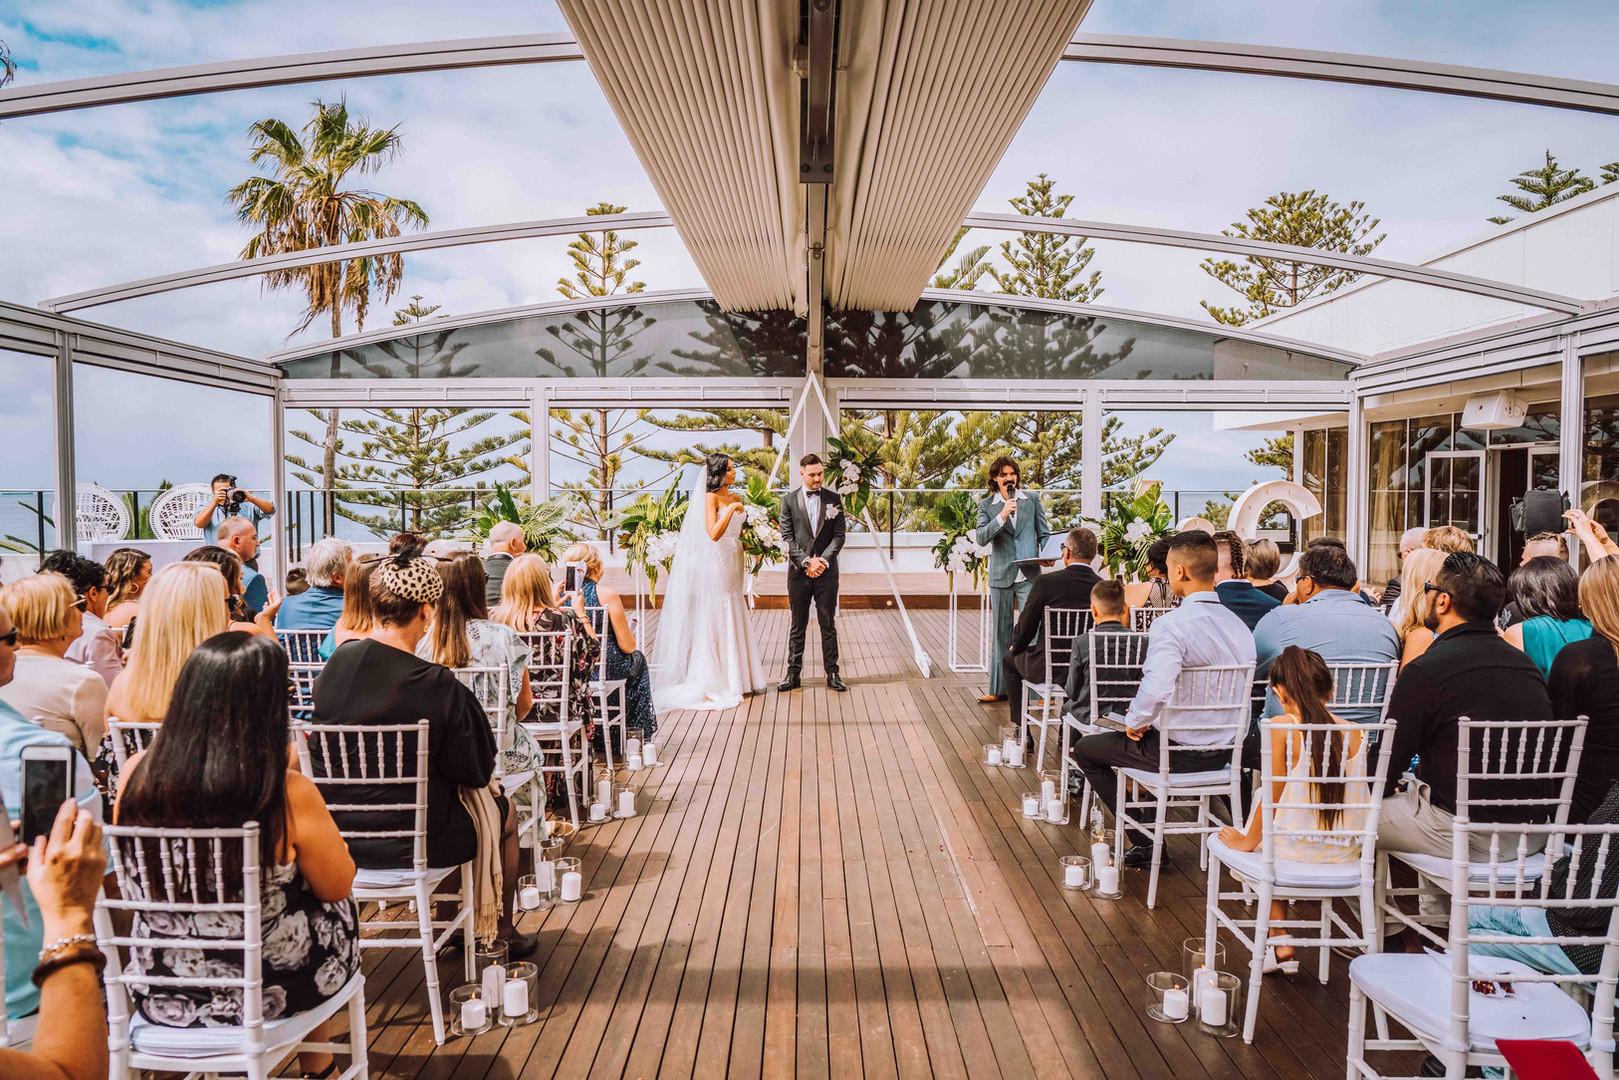 WeddingWebsite_Compressed_A6-11.jpg